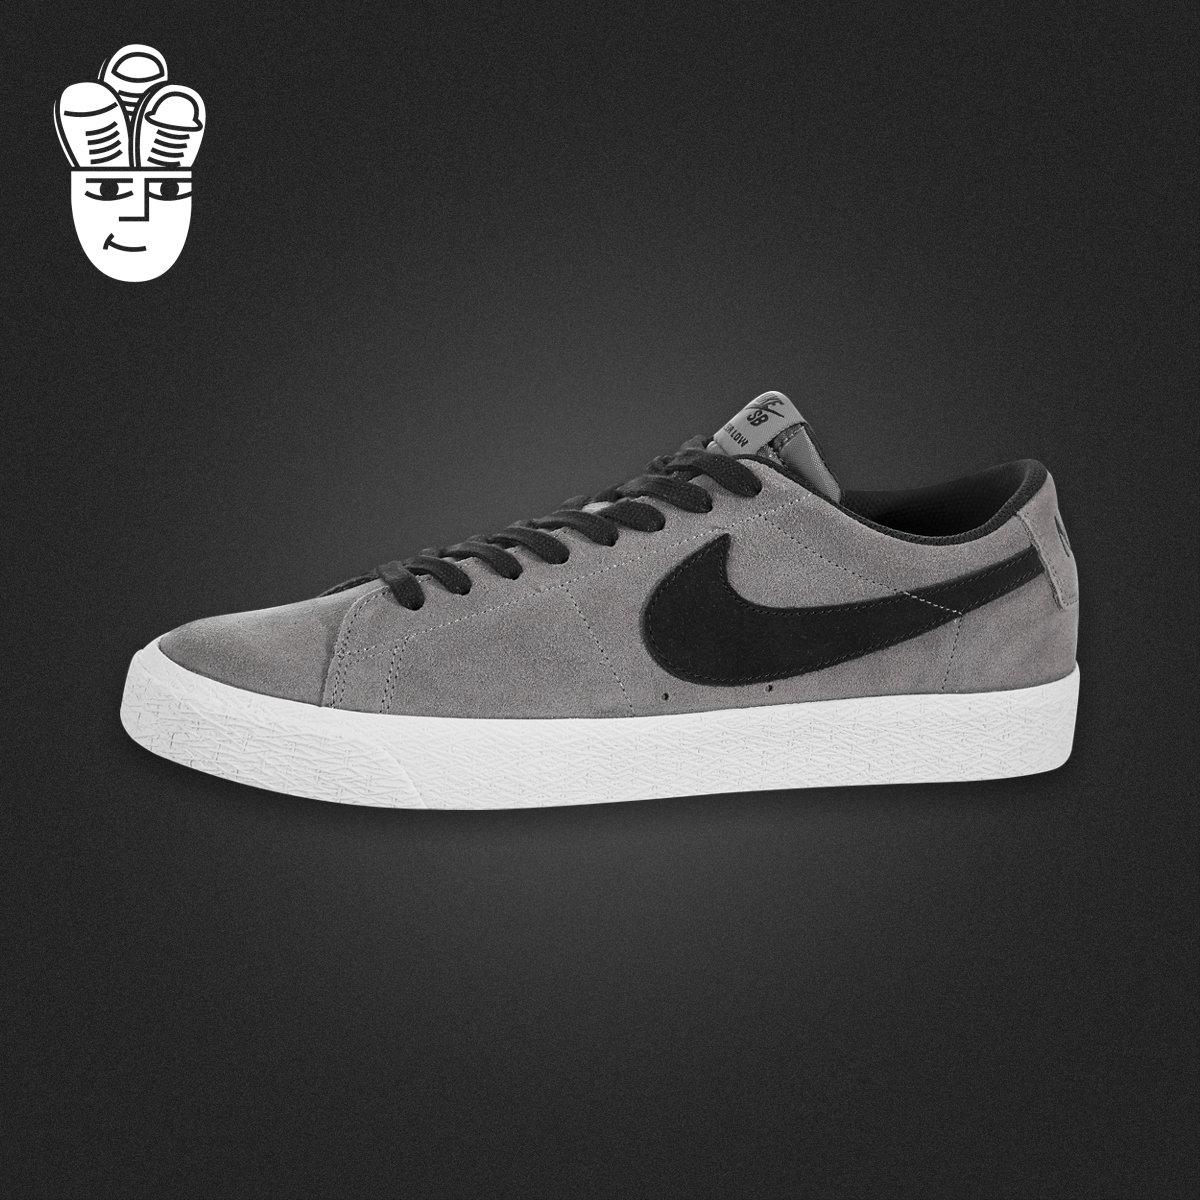 Nike SB Blazer Zoom Low 耐克男鞋 时尚低帮滑板鞋 运动休闲鞋